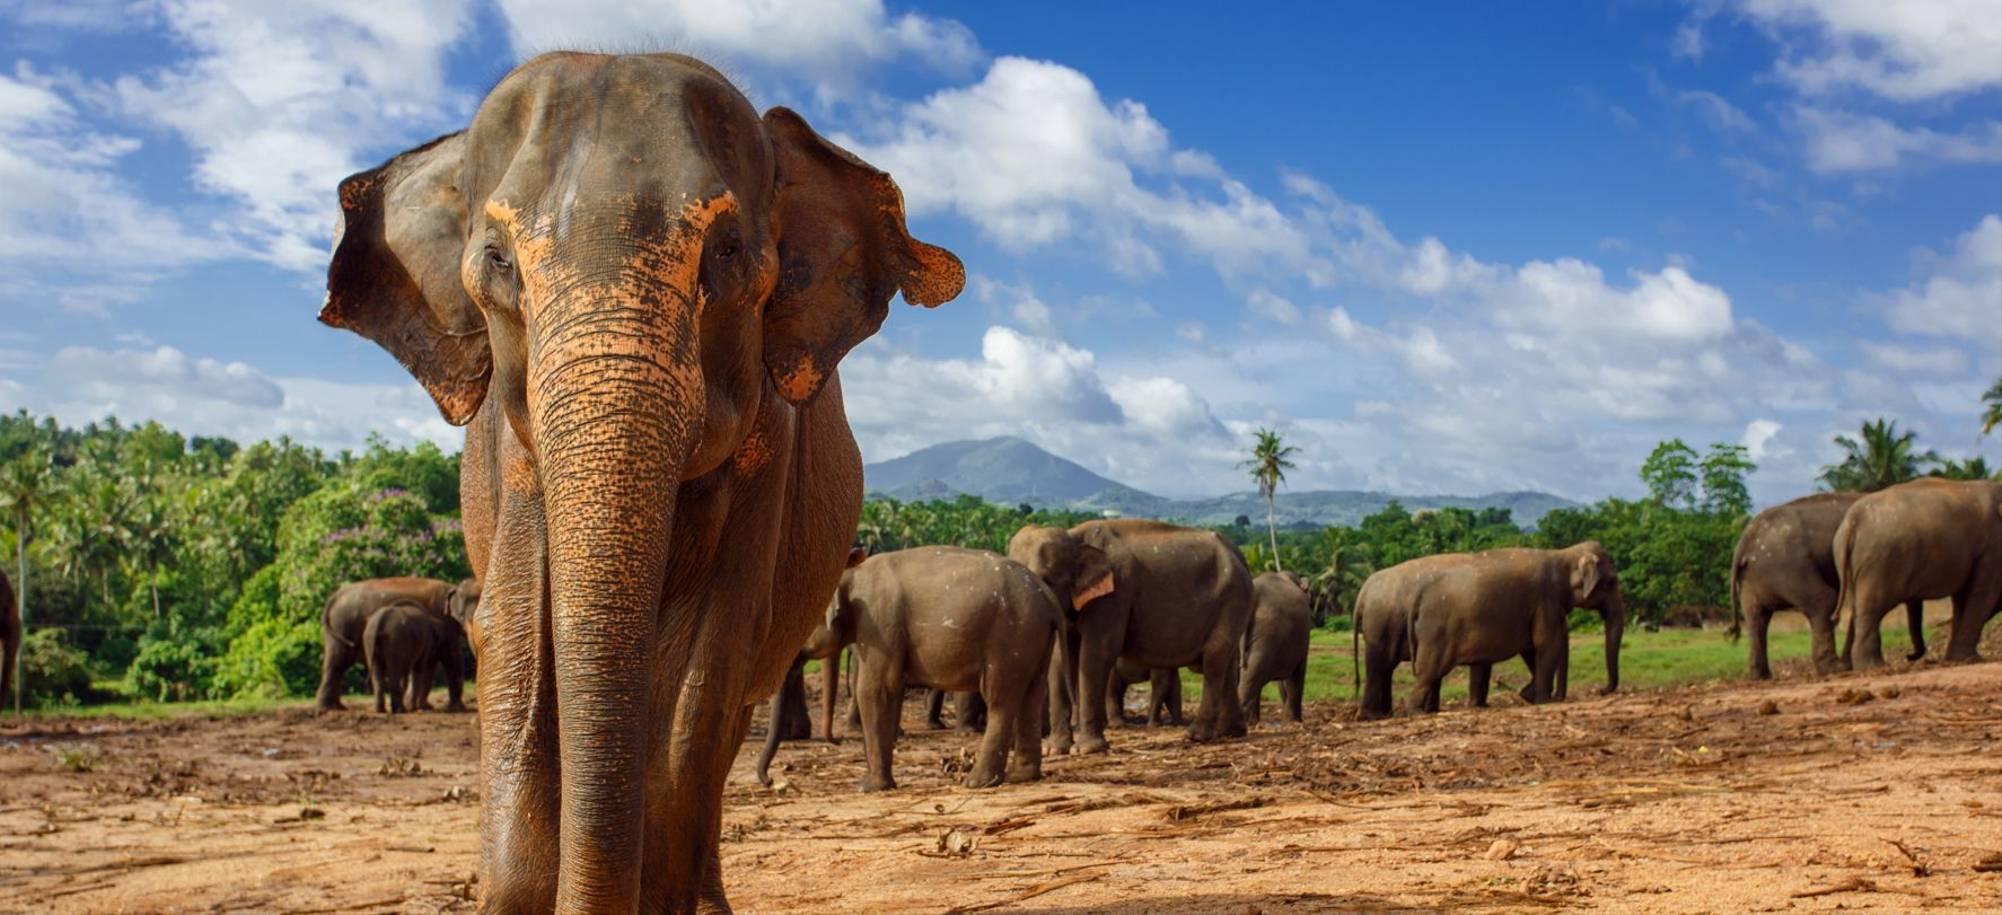 Colombo2   Pinnawala Elephant Orphanage   Itinerary Desktop